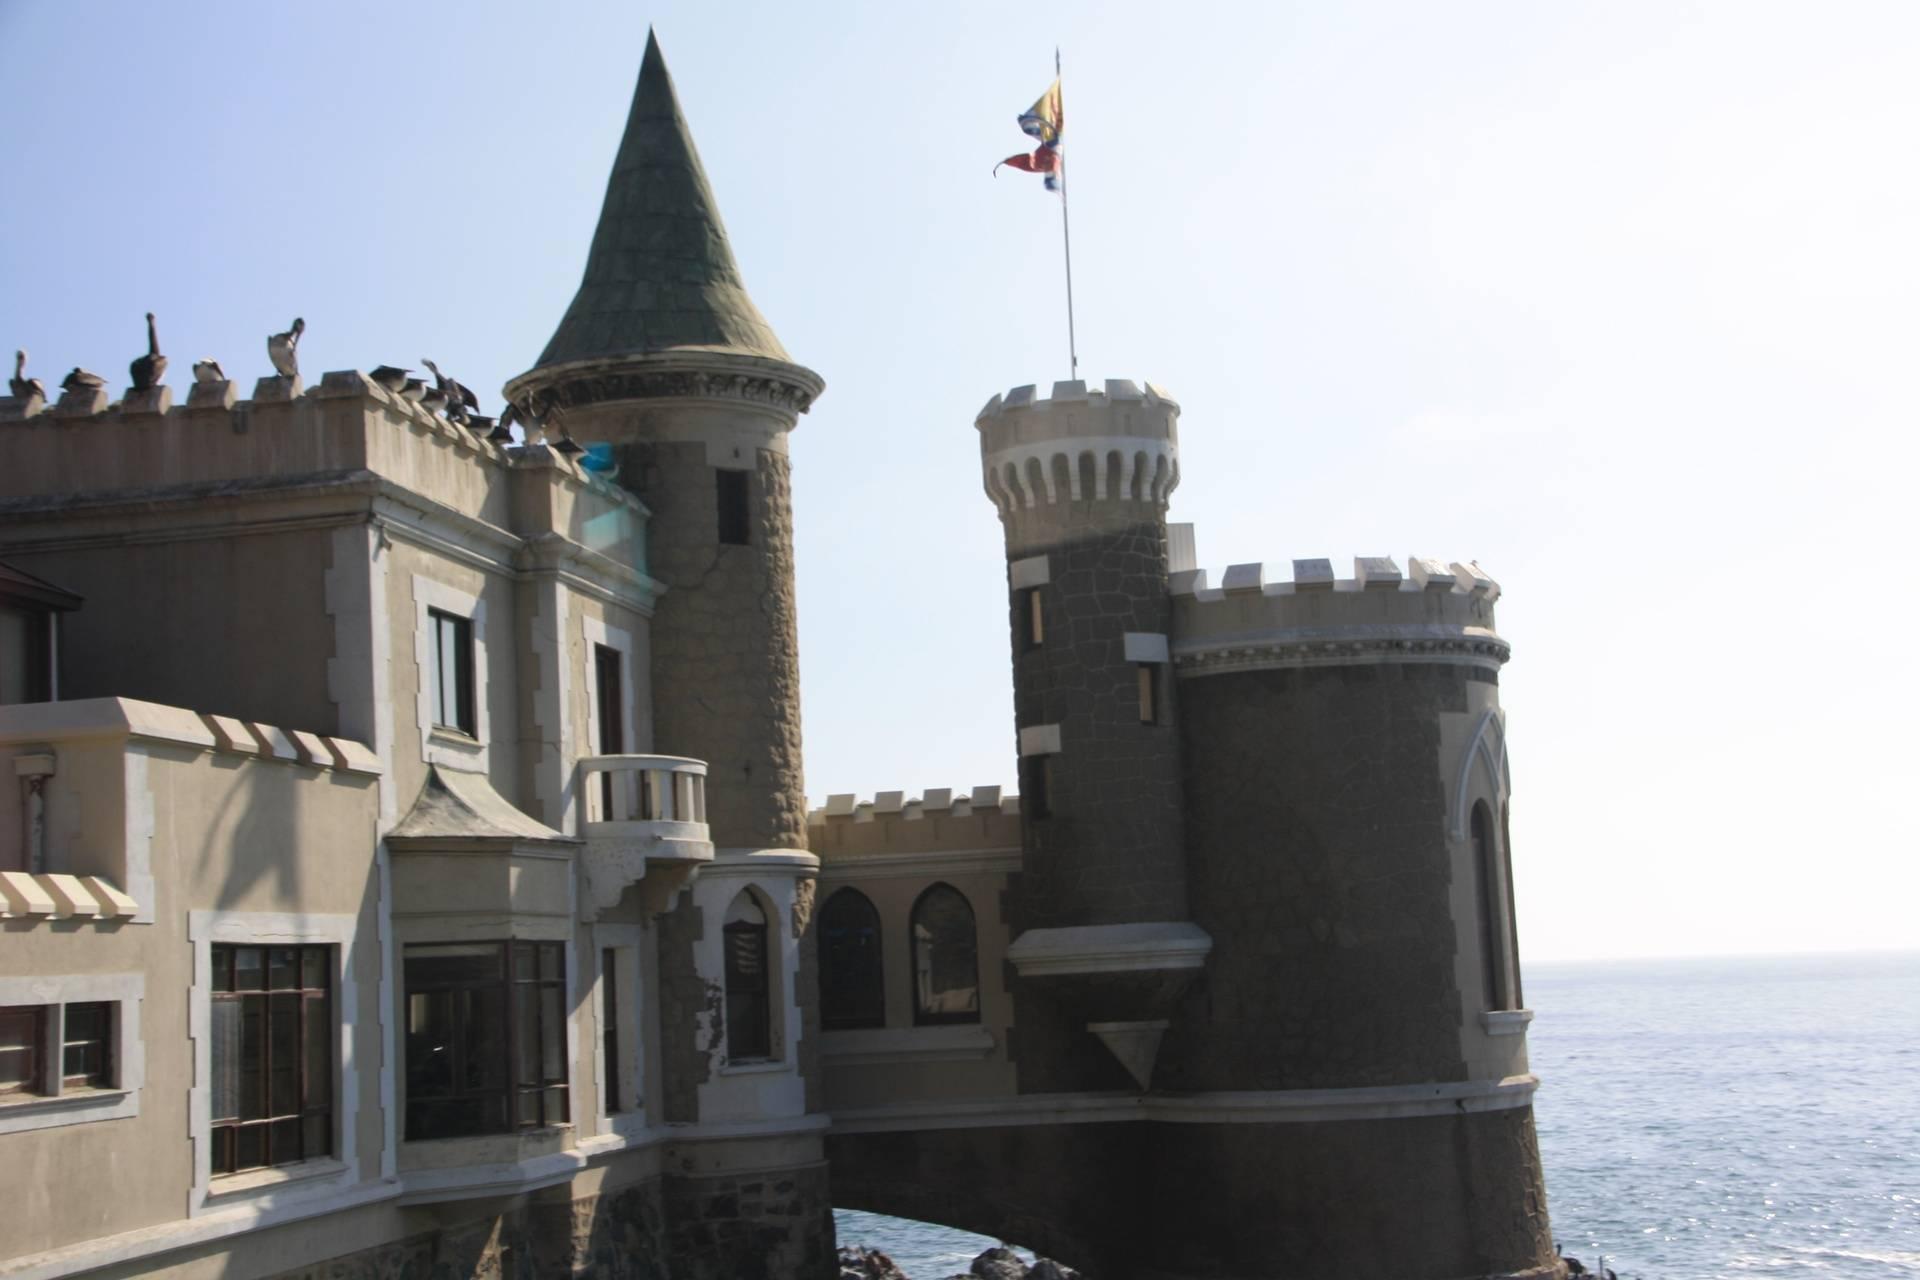 Hotel in Valparaiso, Chili